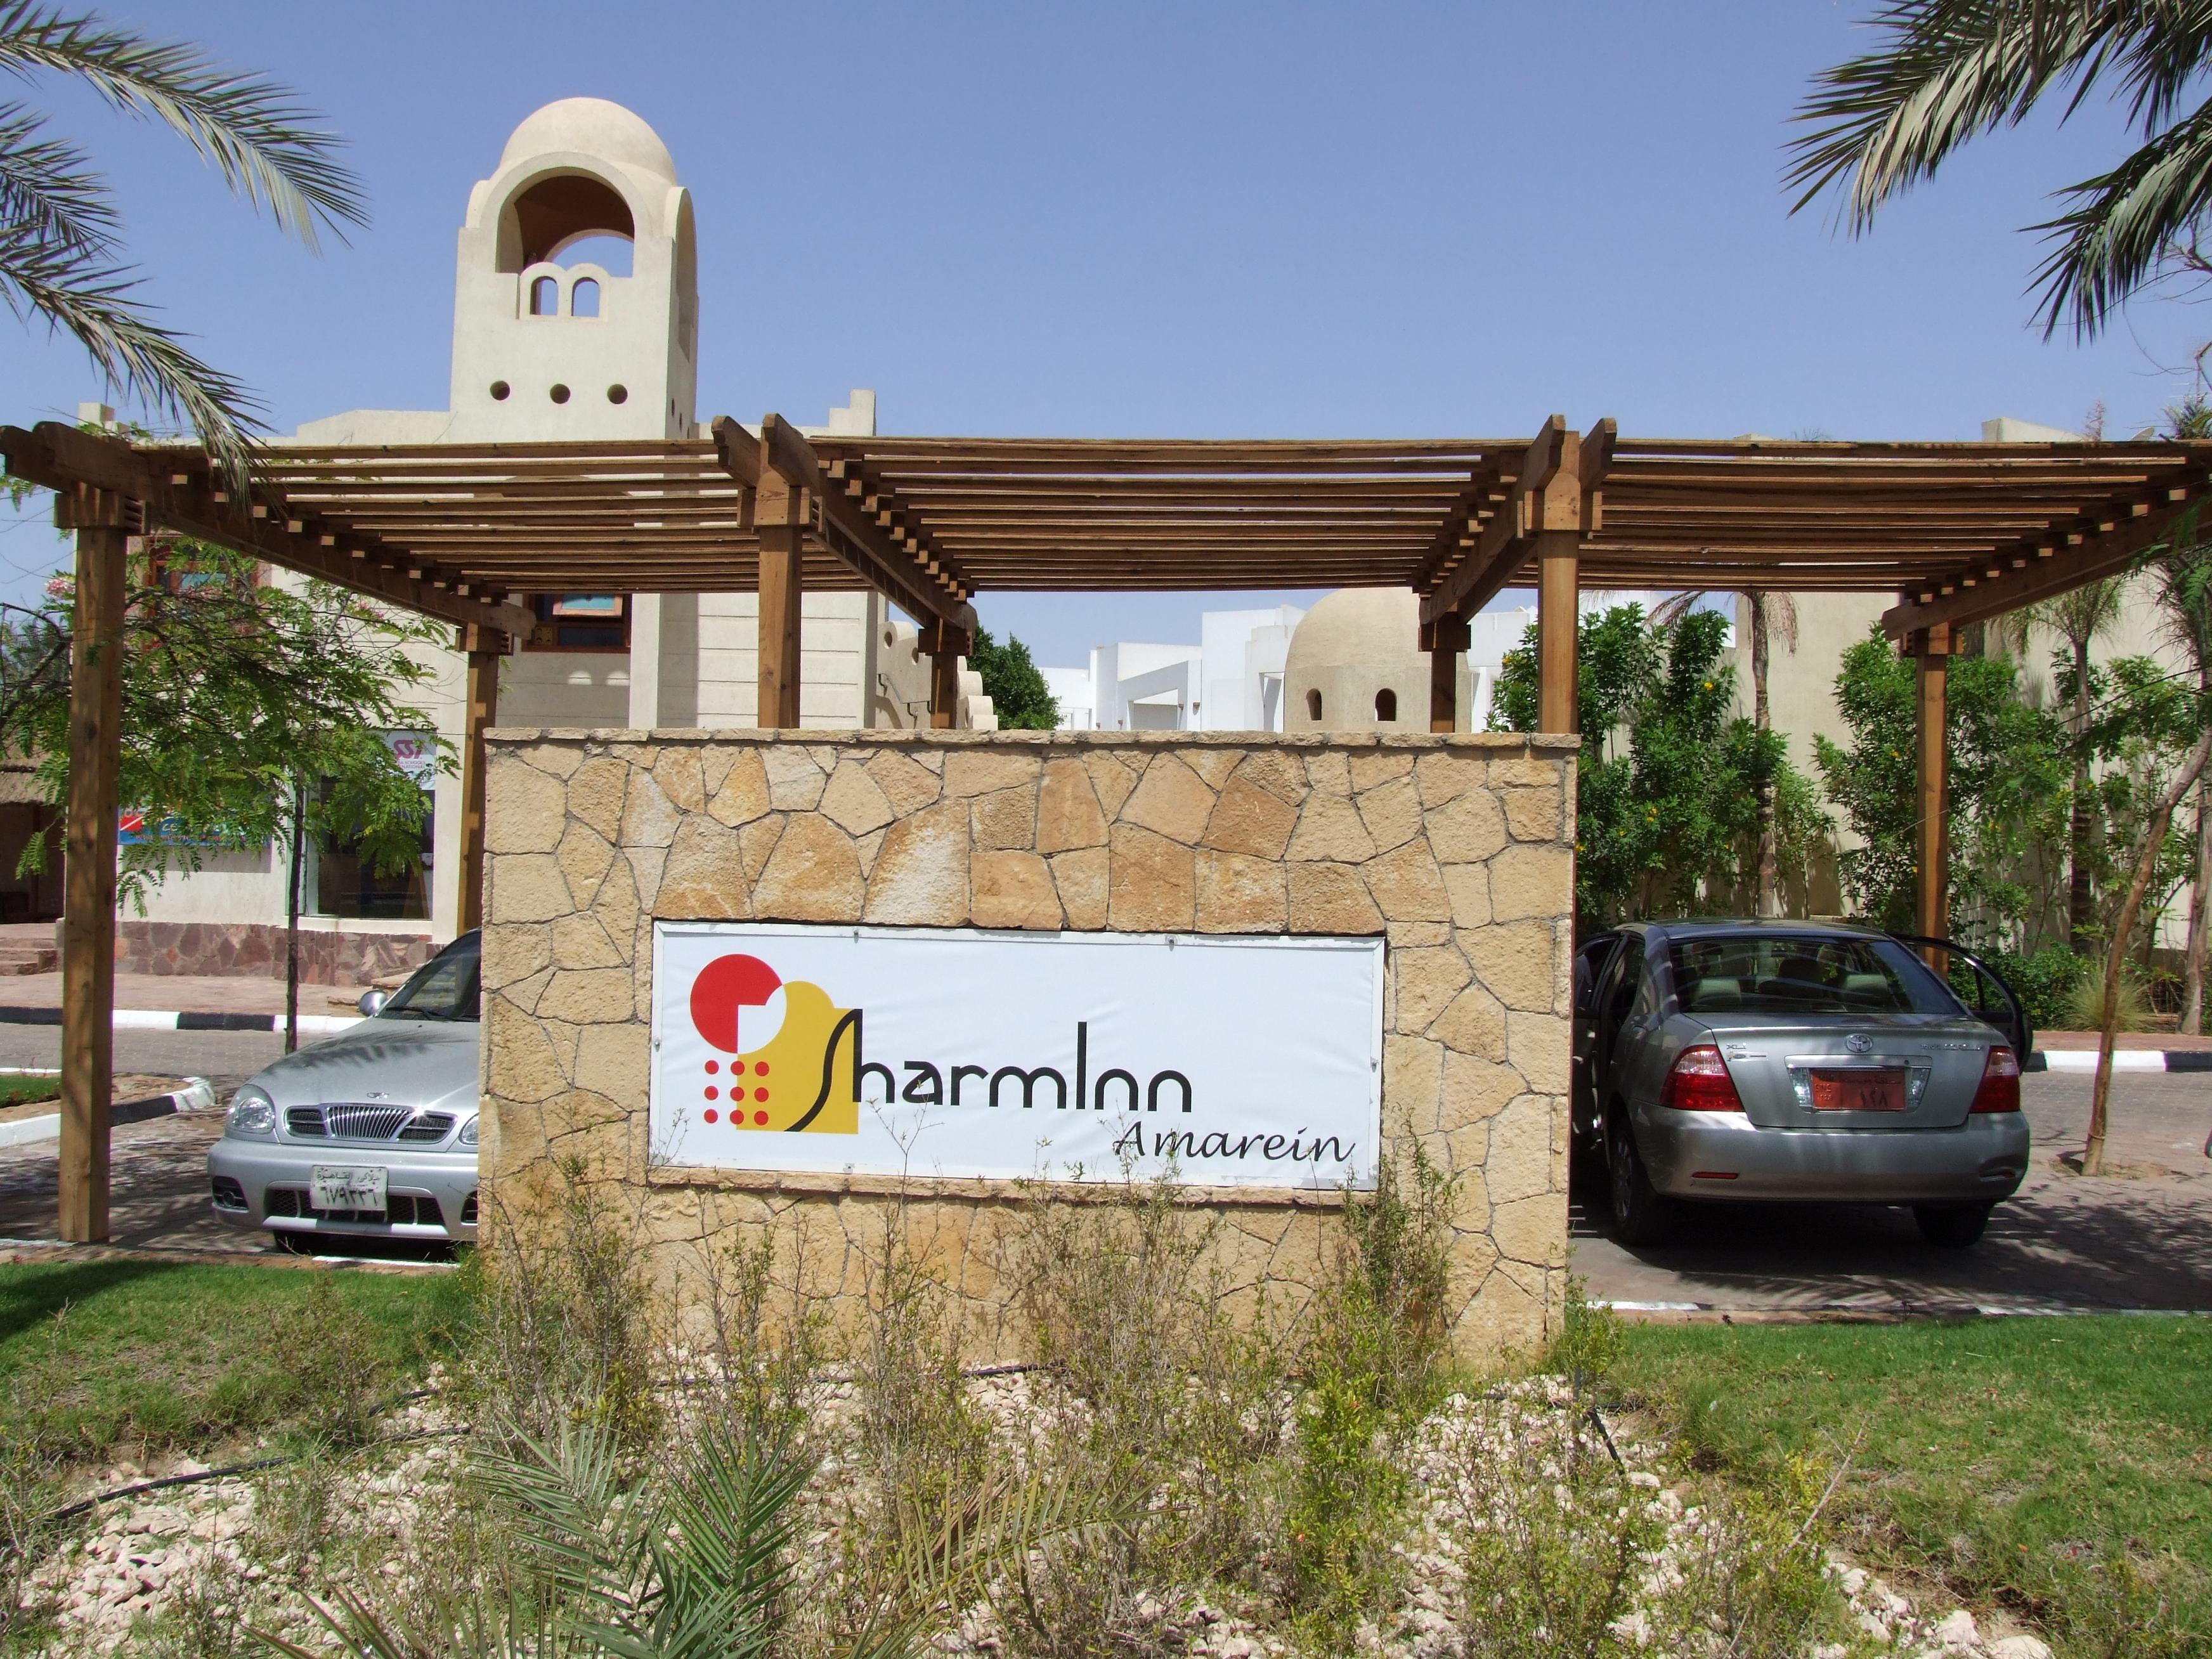 Sharm Inn Amarein, Sharm el-Sheikh